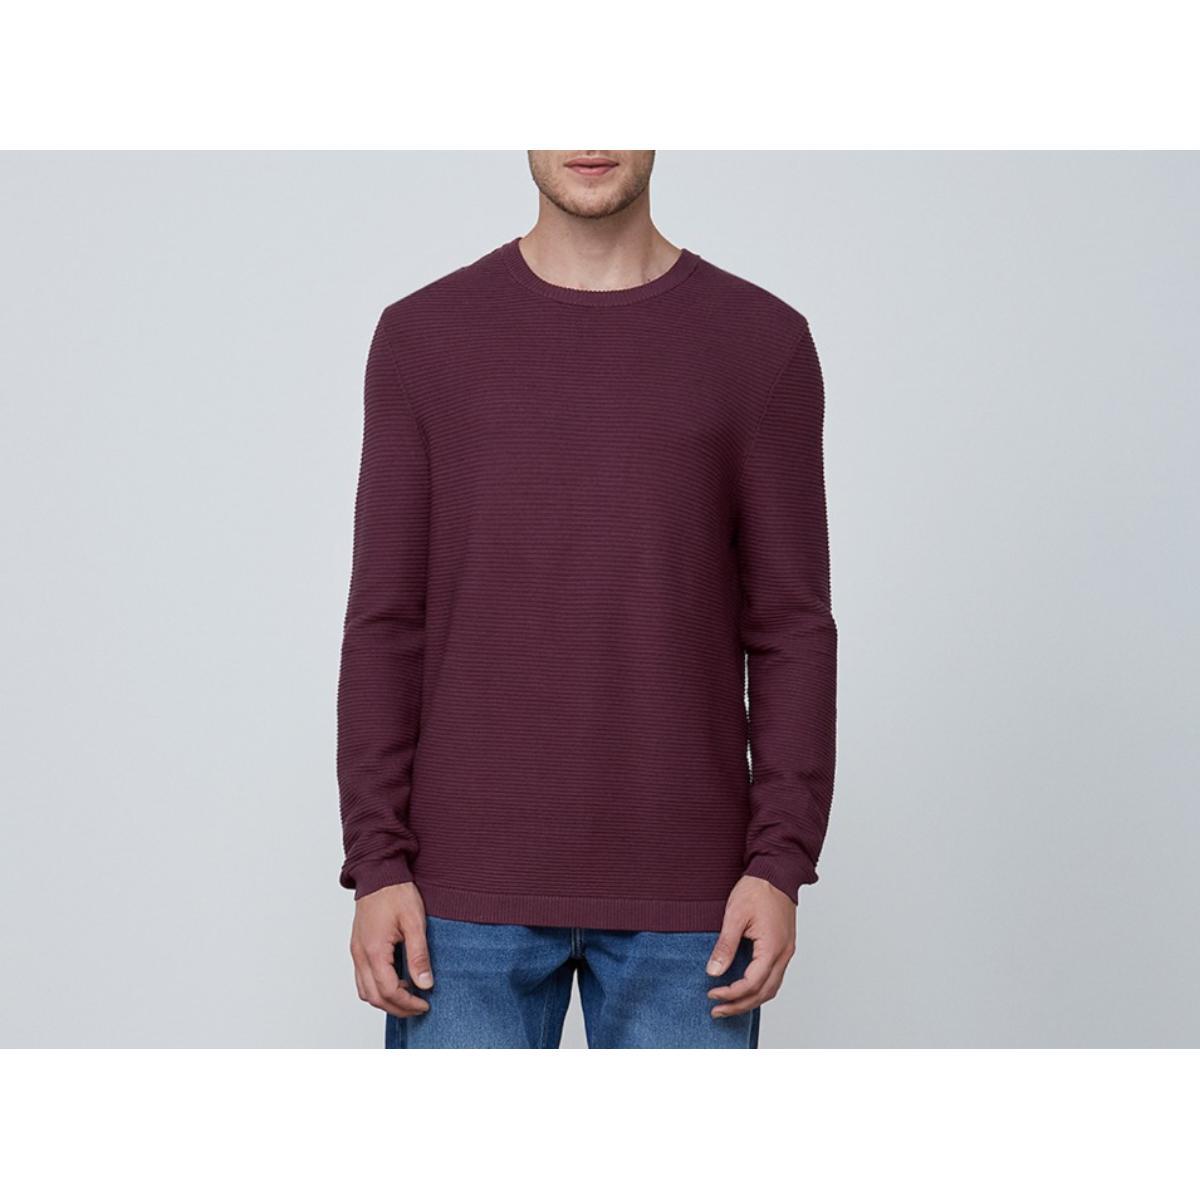 Blusão Masculino Dzarm Zn34 Rwxsi Vinho